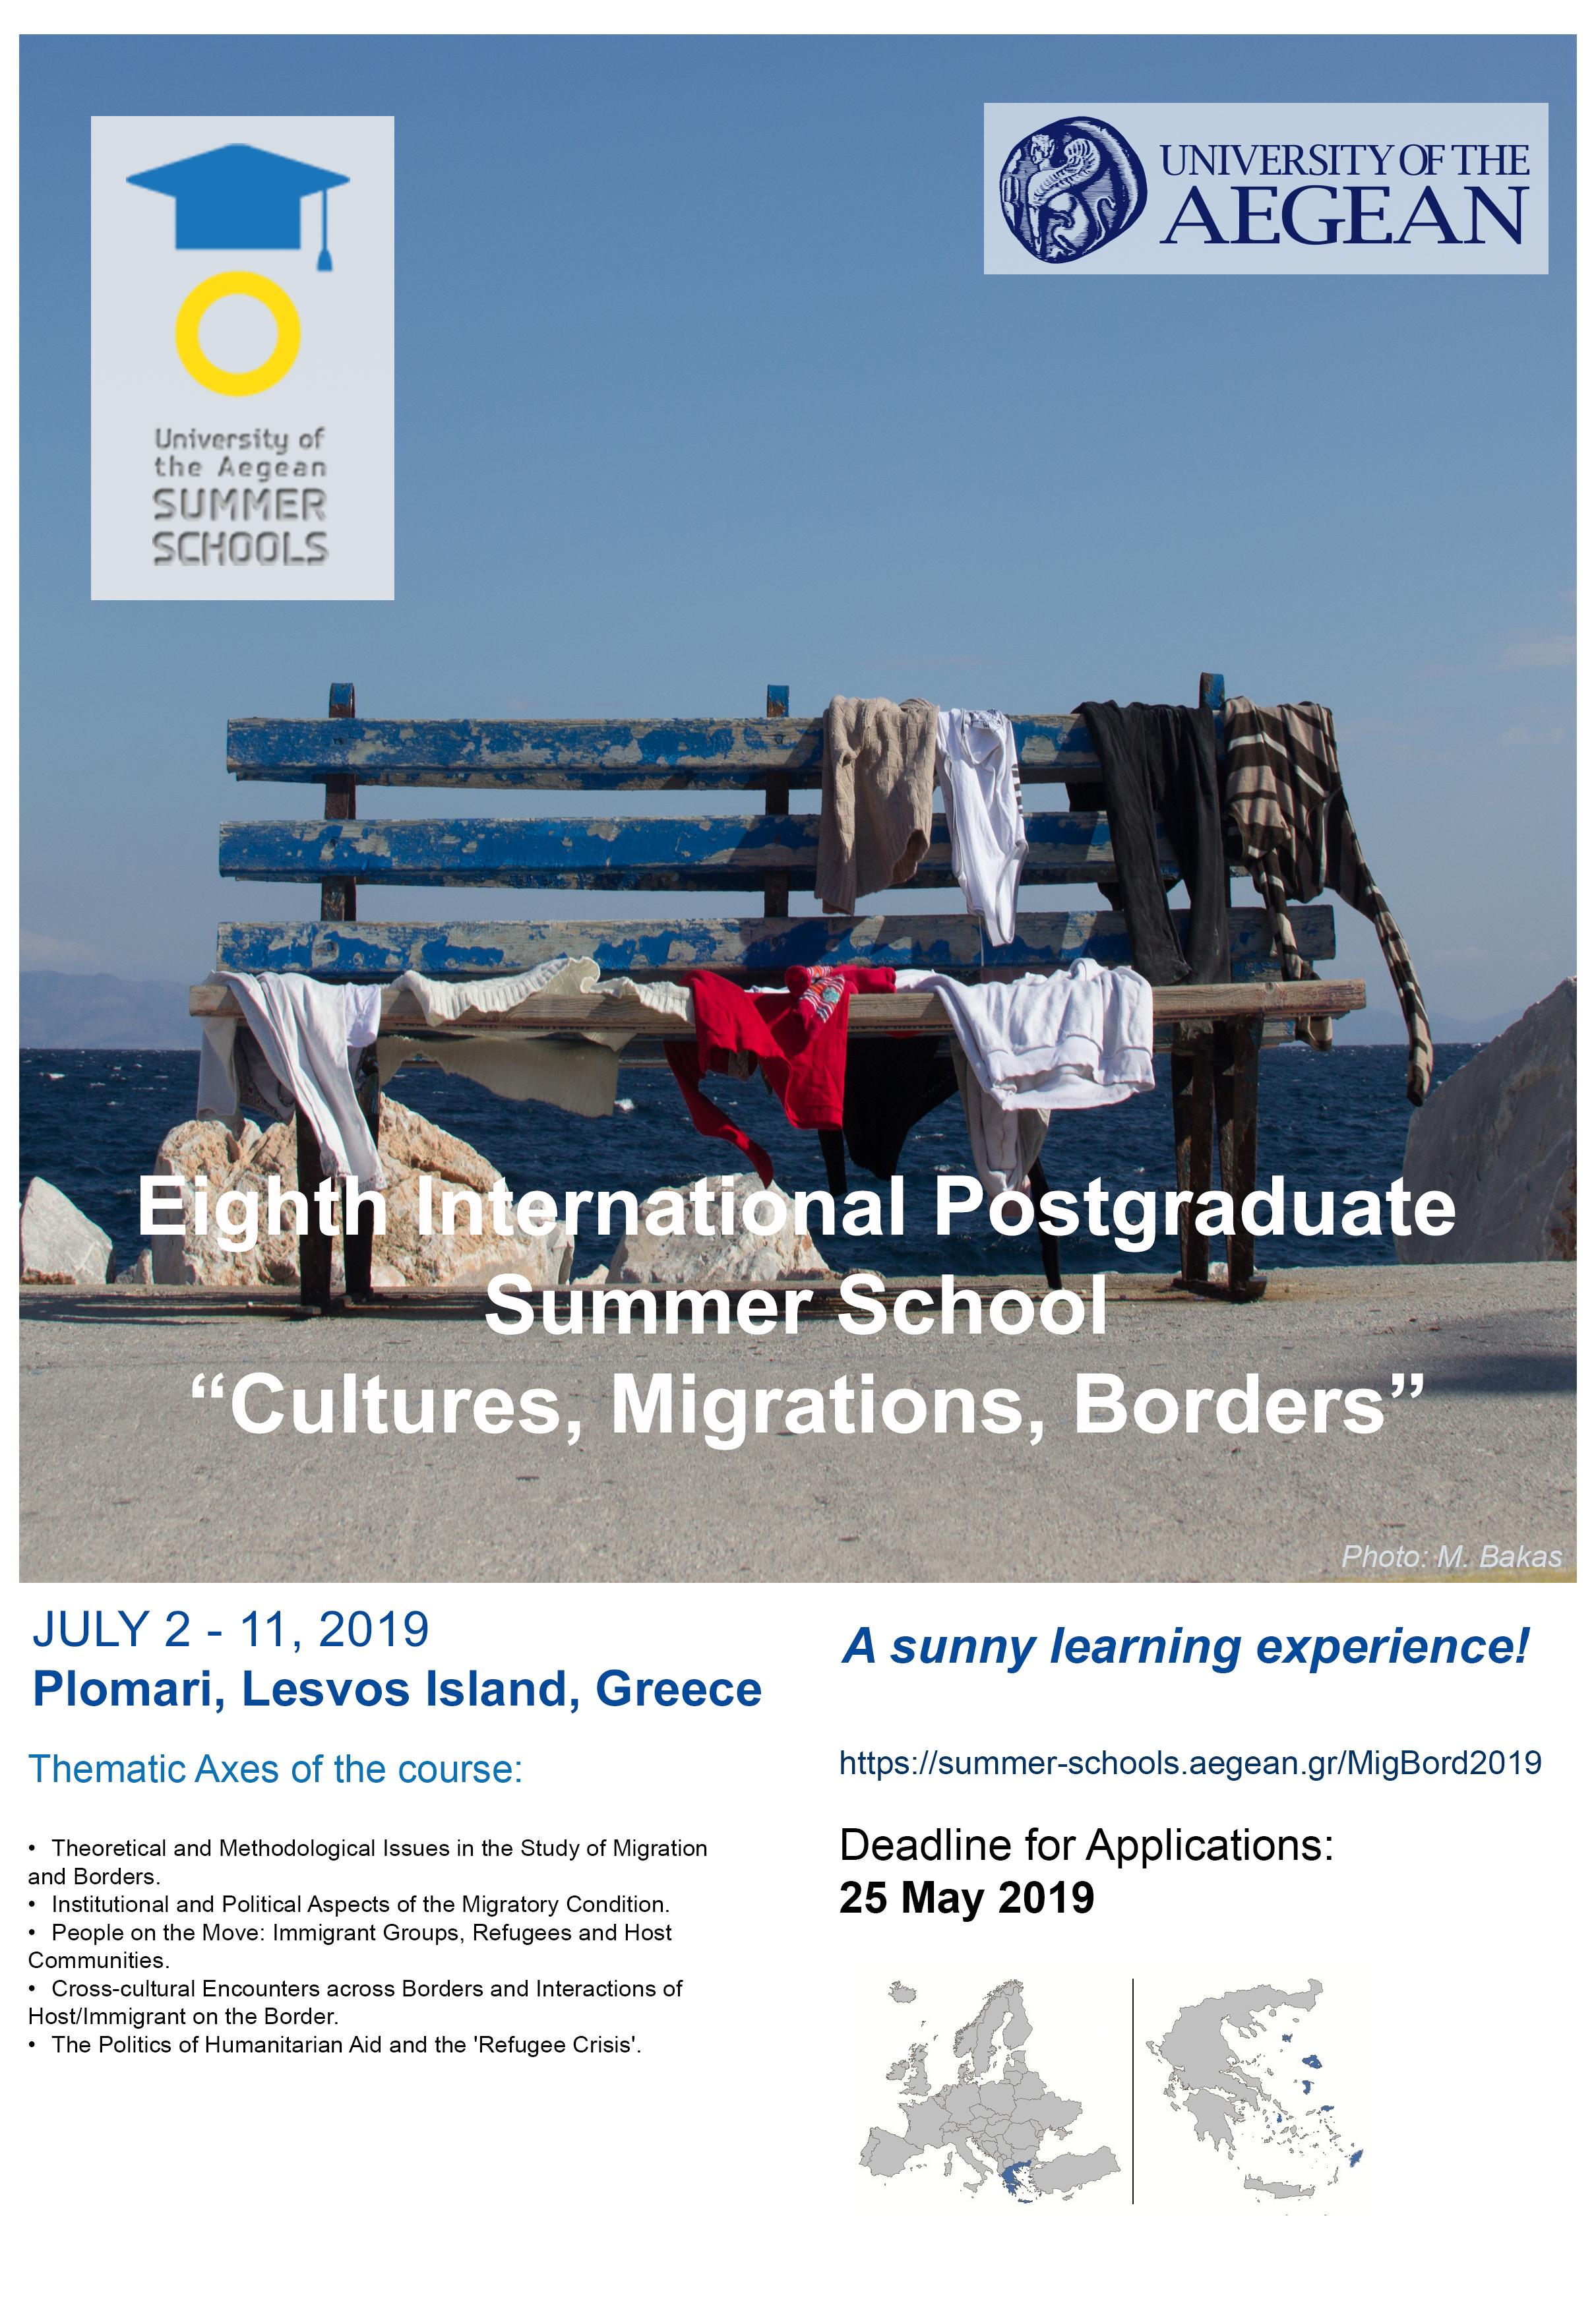 Summer Schools - University of the Aegean |